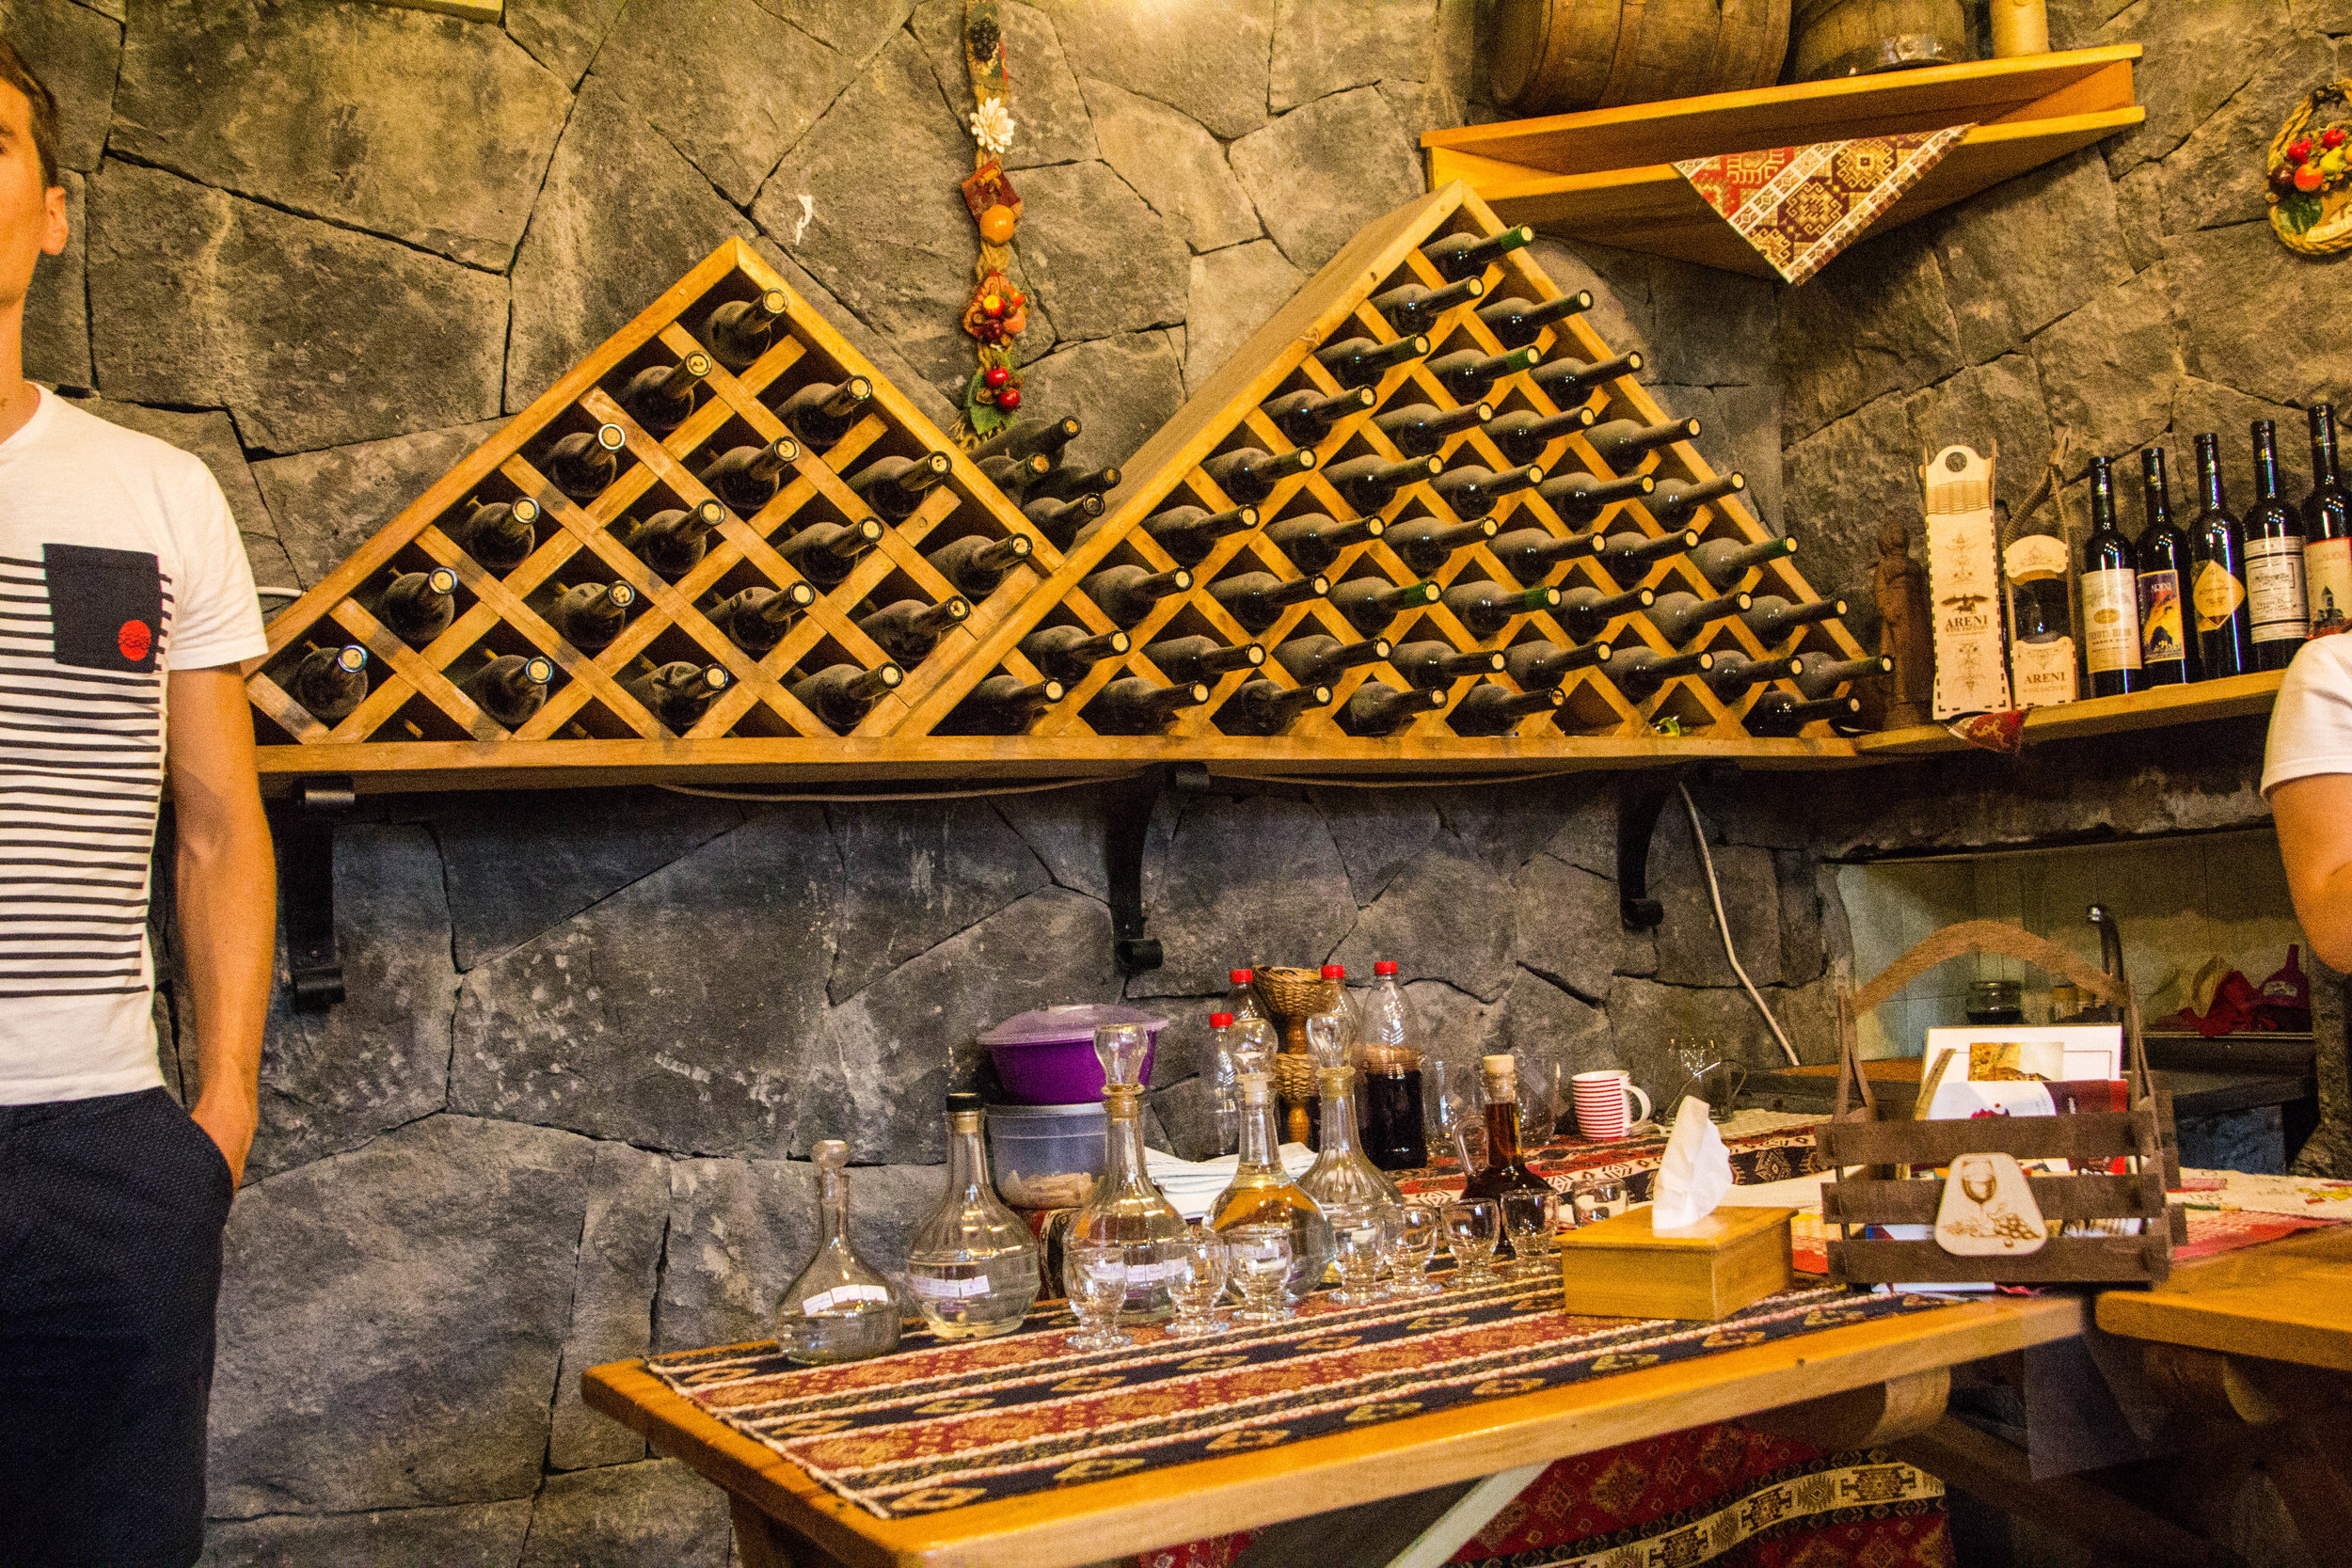 armenian-wine-tasting-4.jpg